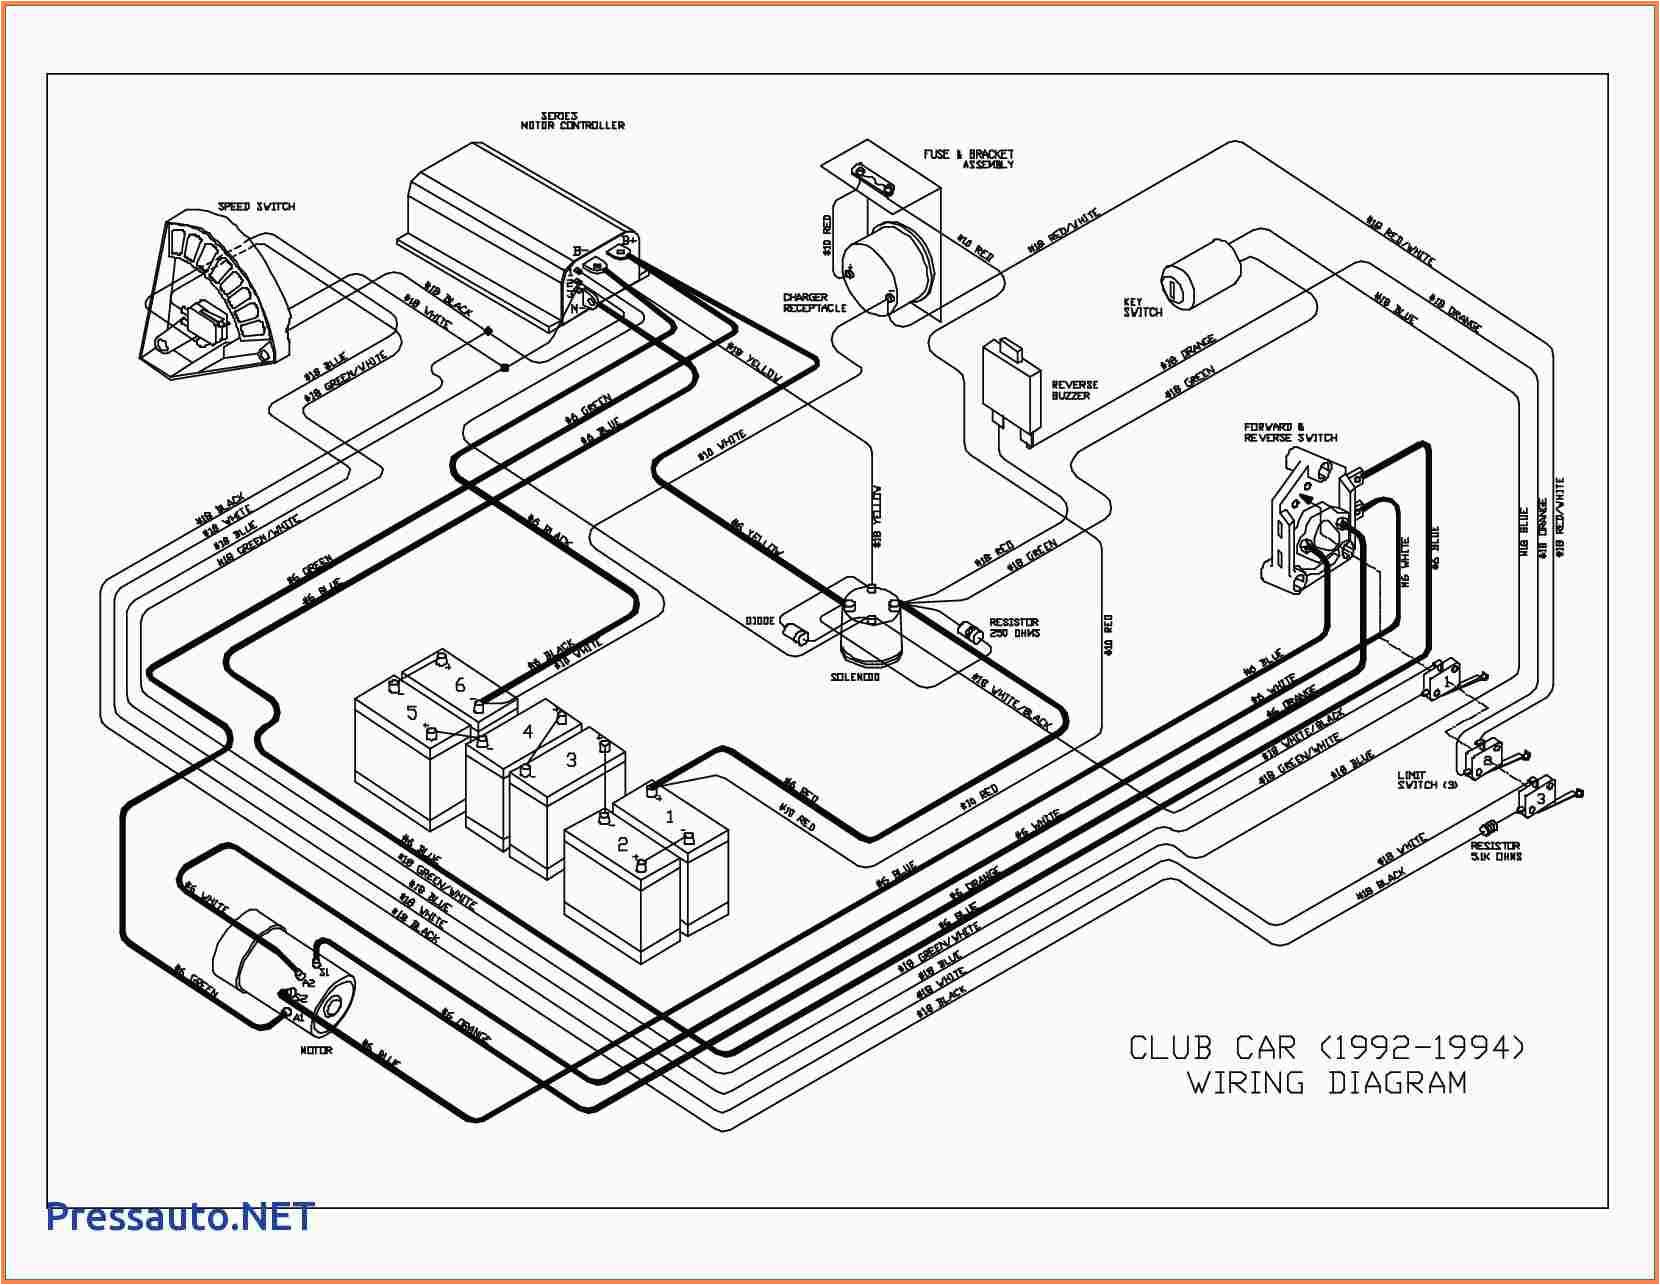 ezgo forward reverse switch wiring diagram unique 36 volt club car golf cart wiring diagram for gas within and 2 in of ezgo forward reverse switch wiring diagram at club car golf cart wiring diagram jpg